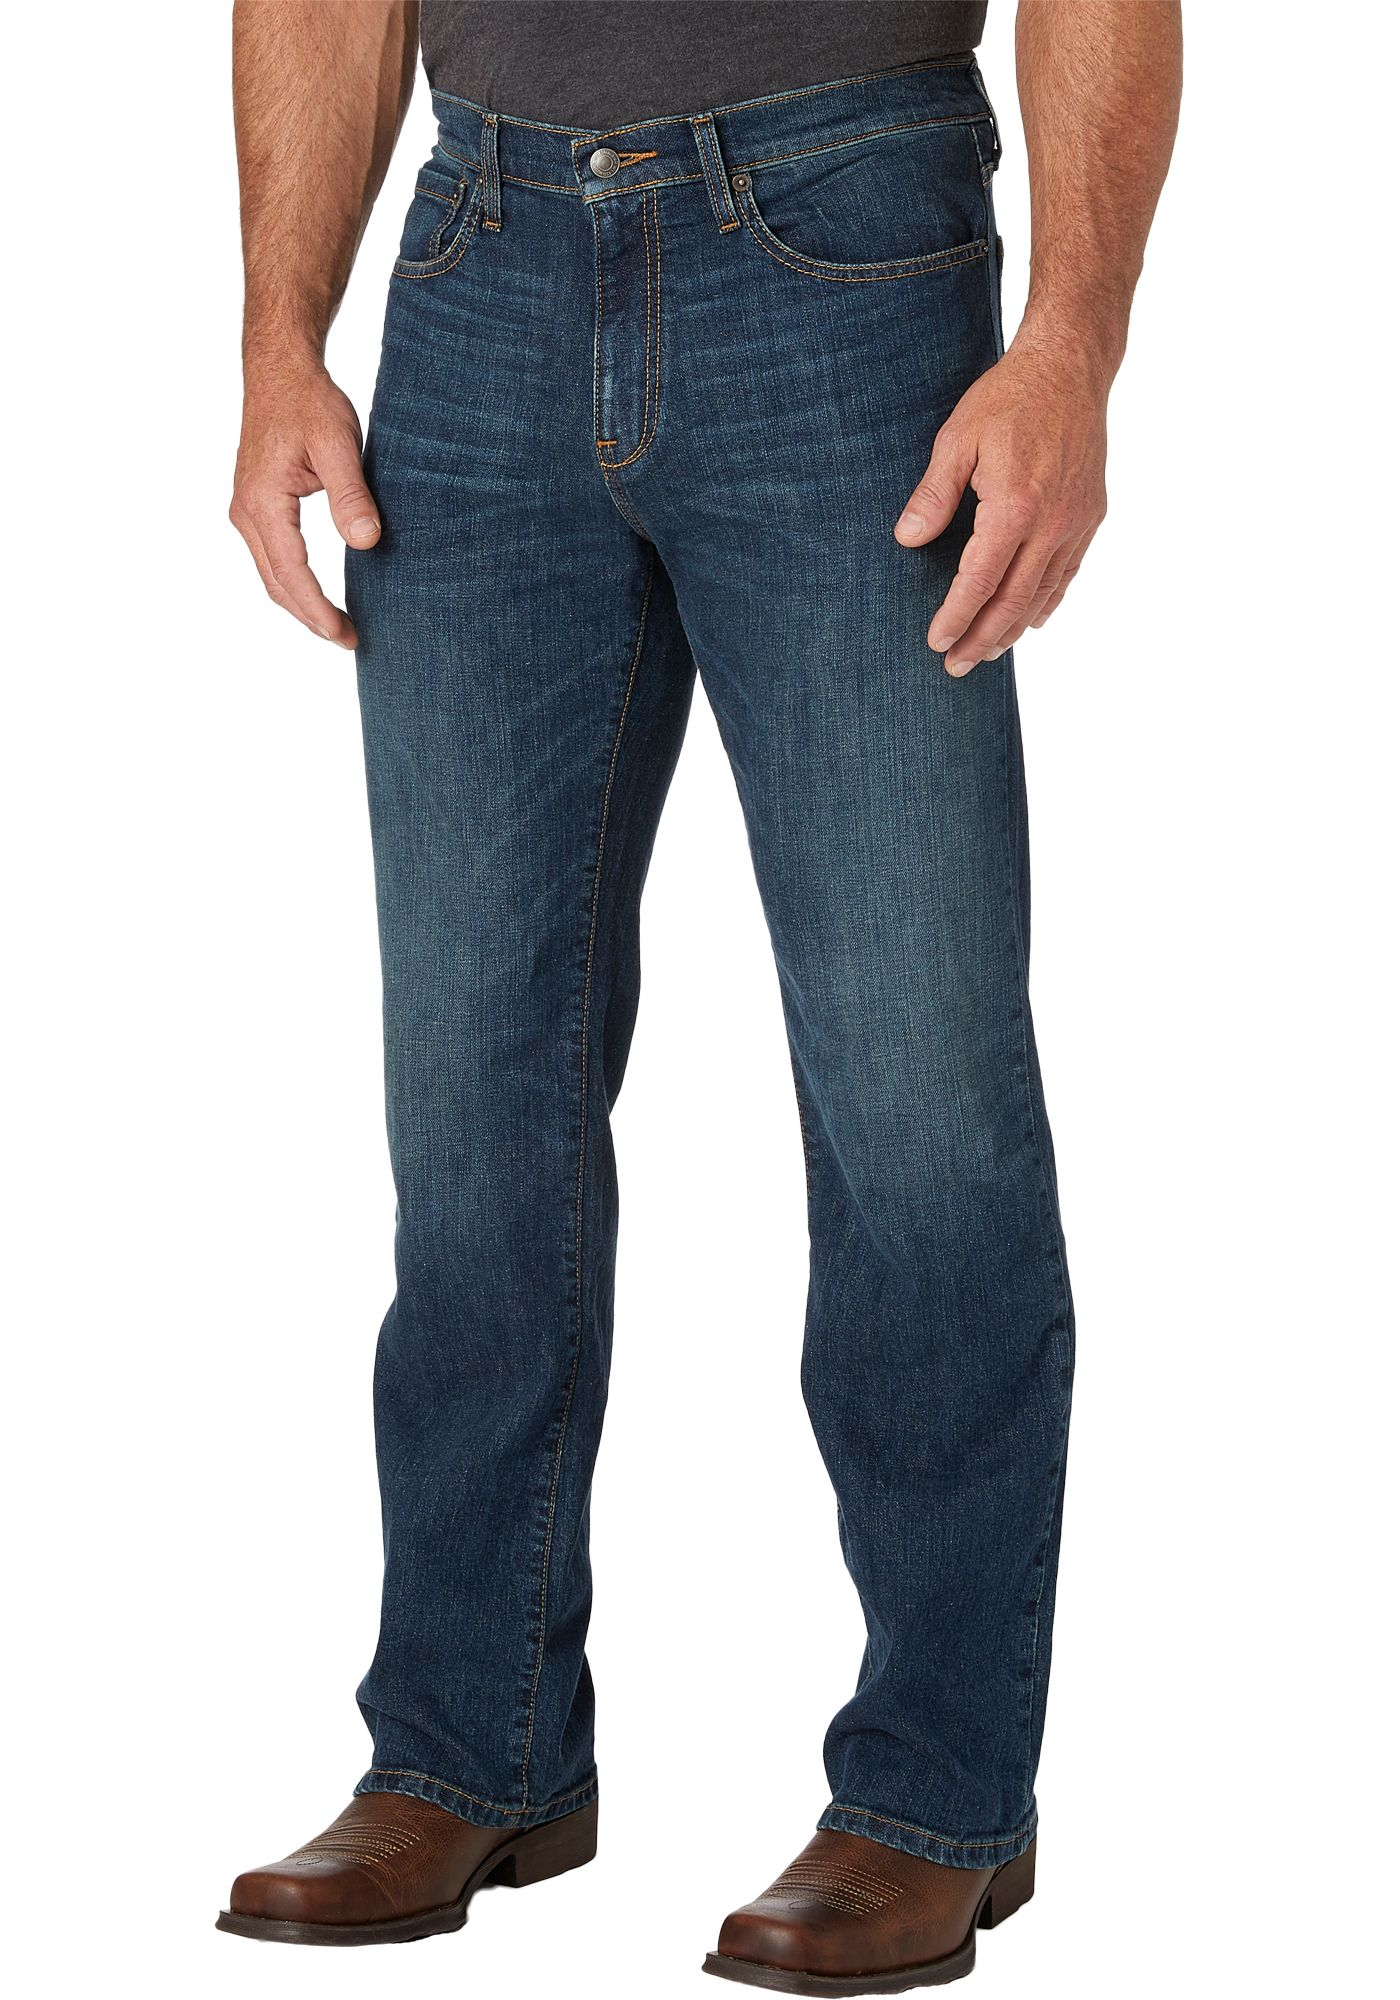 Field & Stream Men's DuraComfort Bootcut Denim Jeans